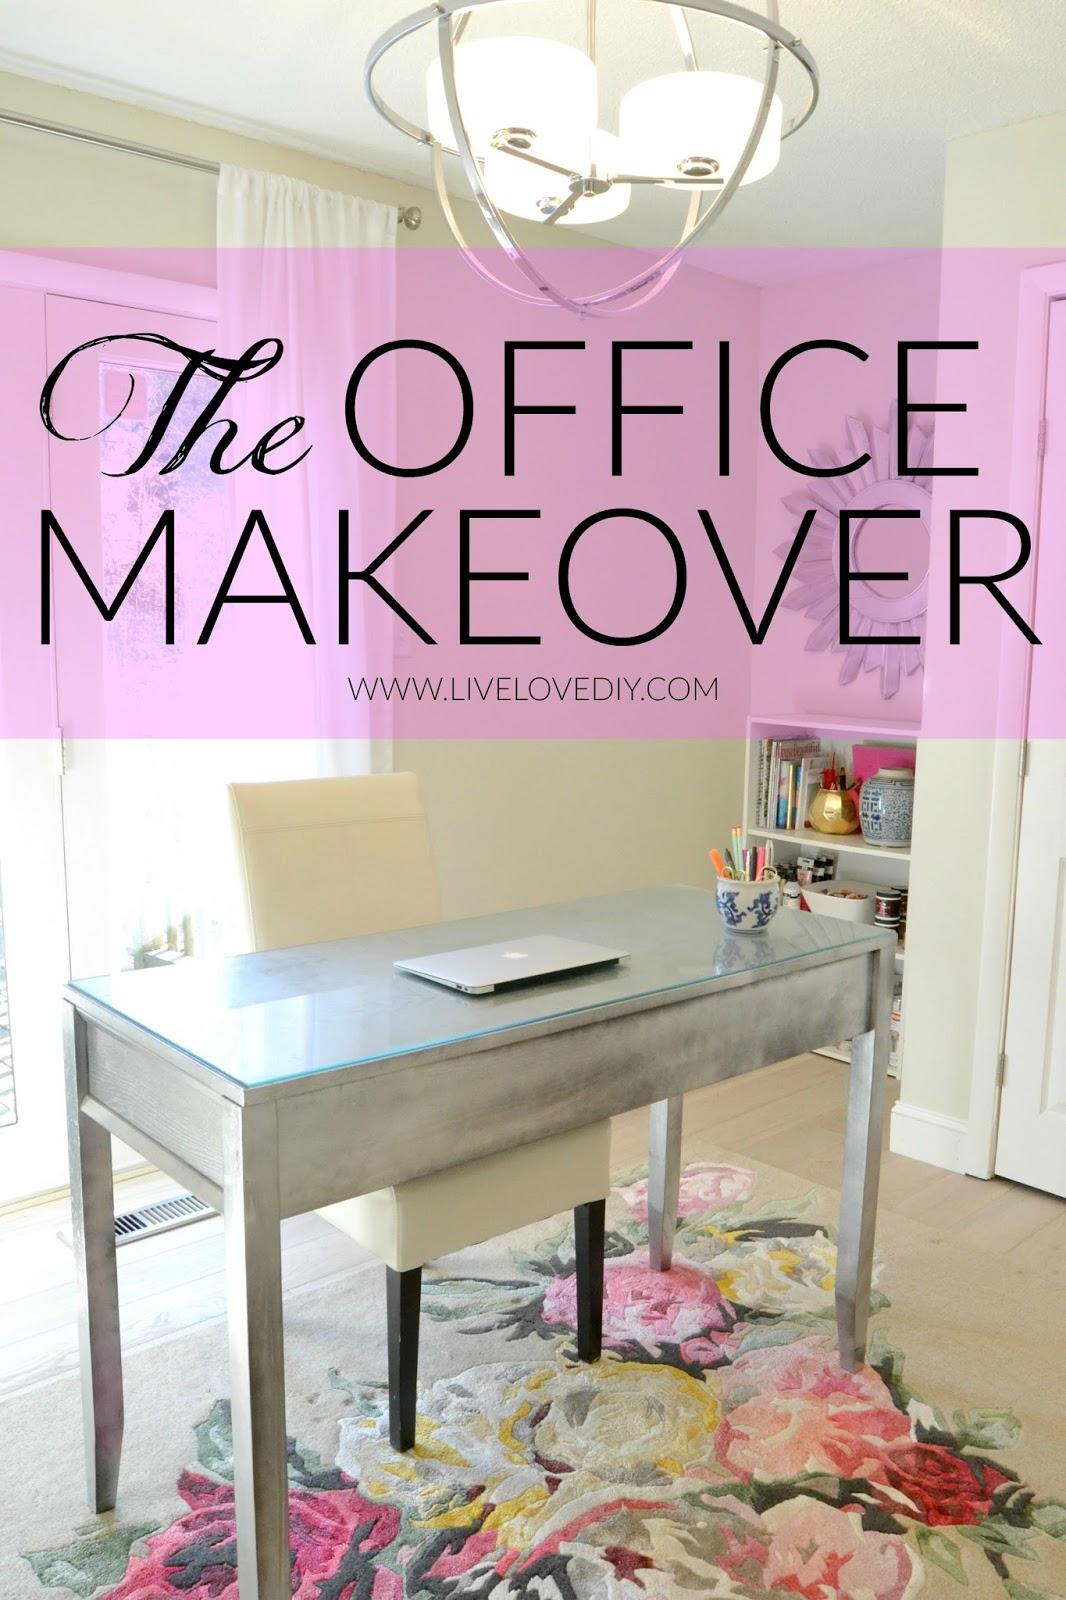 LiveLoveDIY: Home Office Decorating Ideas: My Latest ...